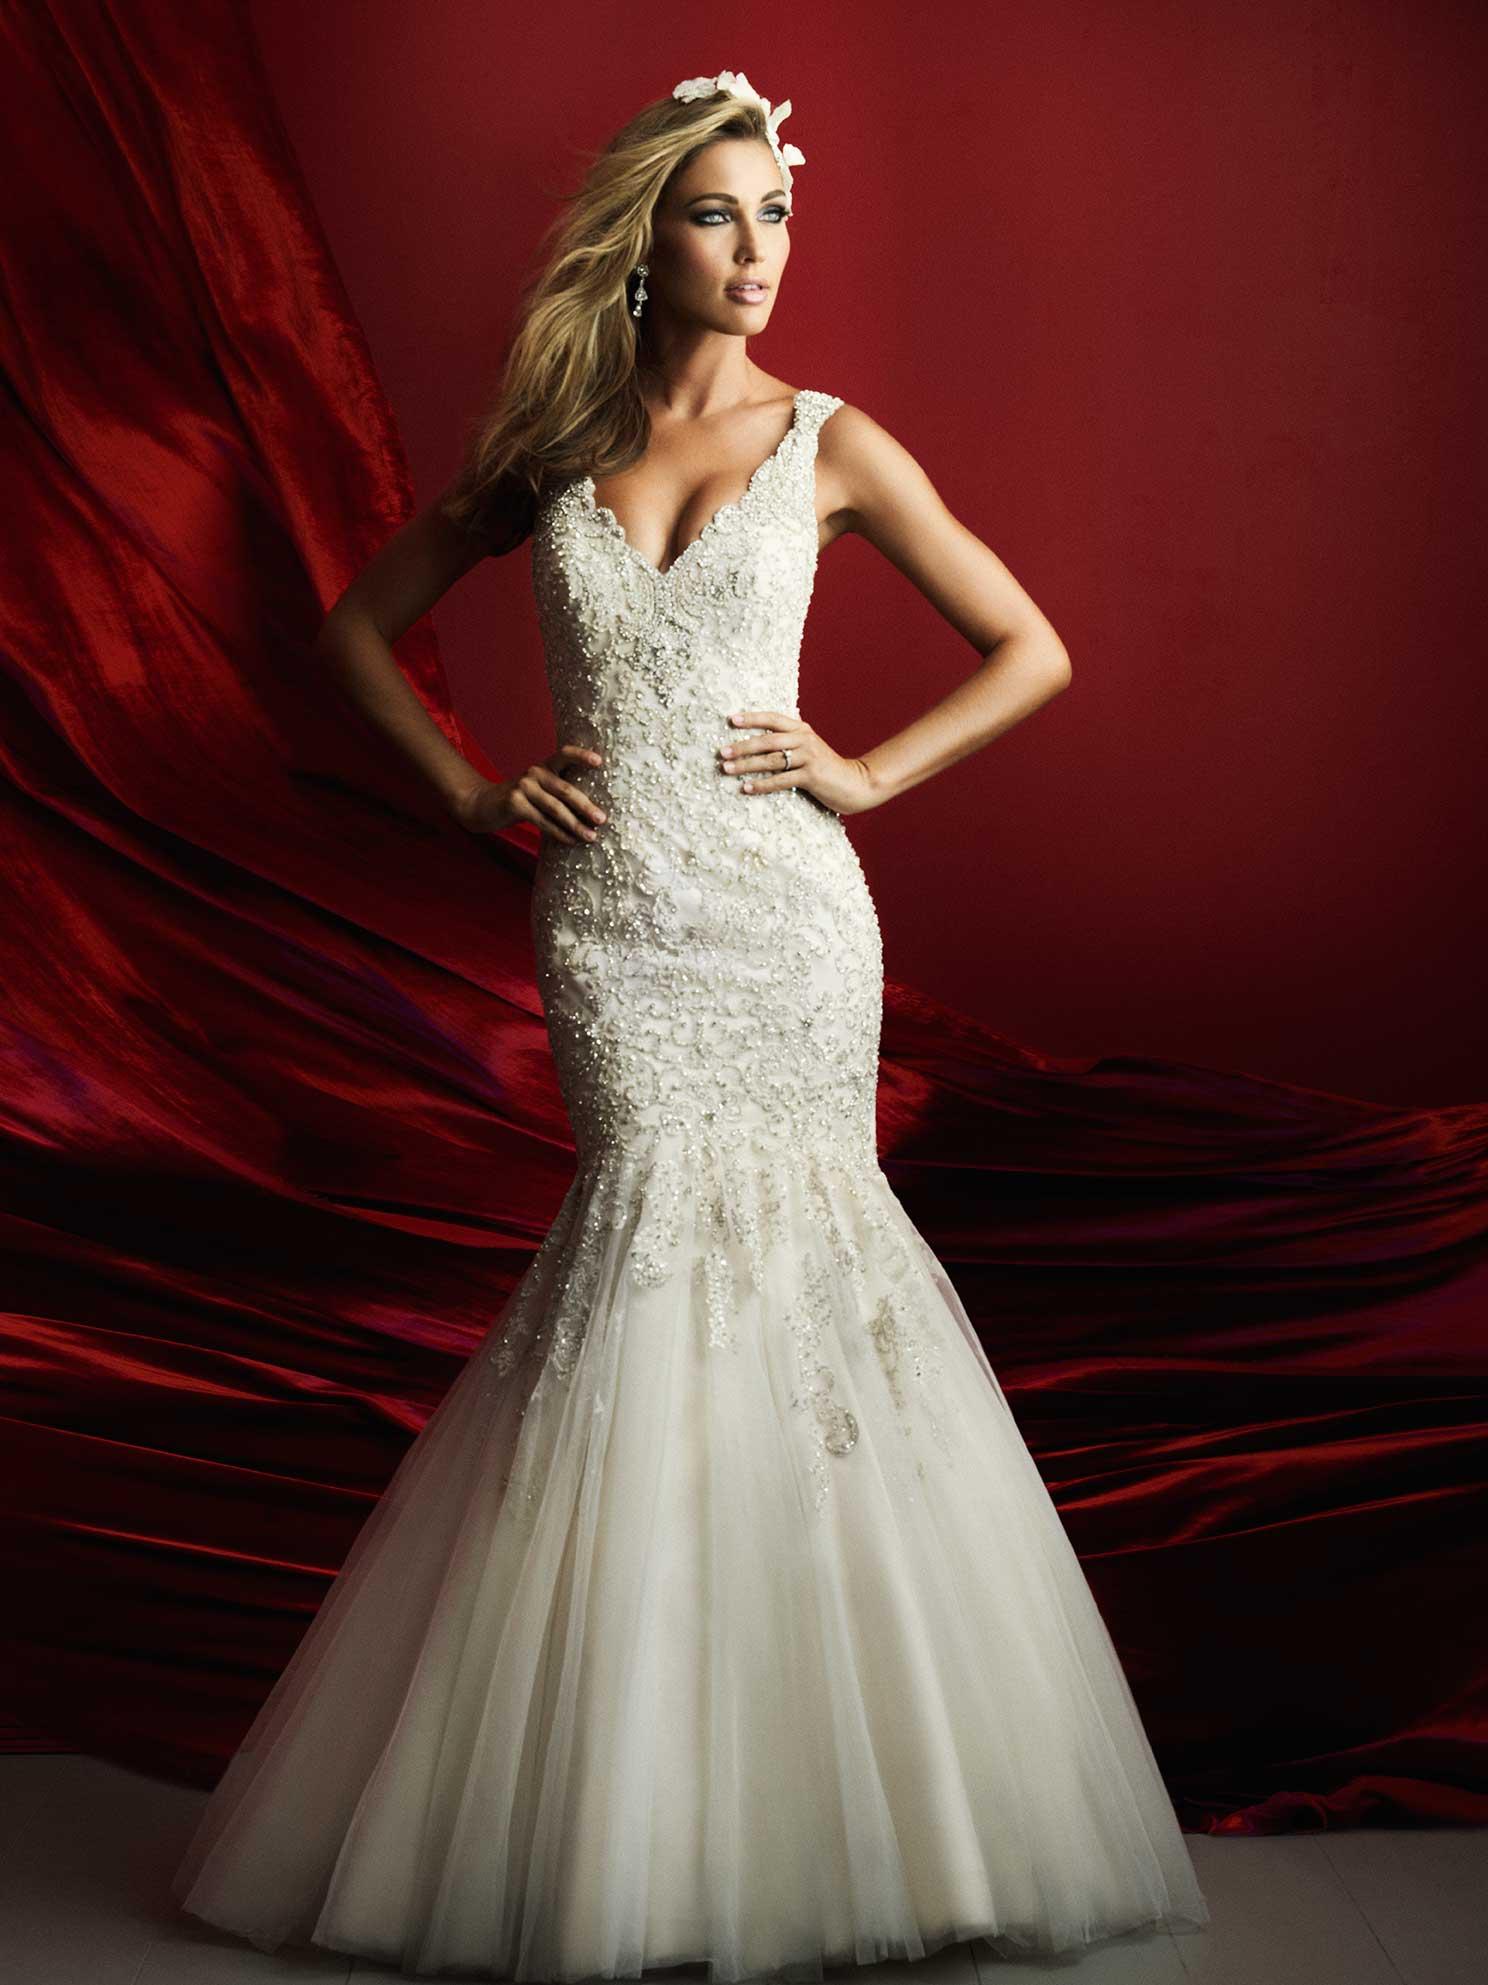 allure wedding dresses price photo - 1